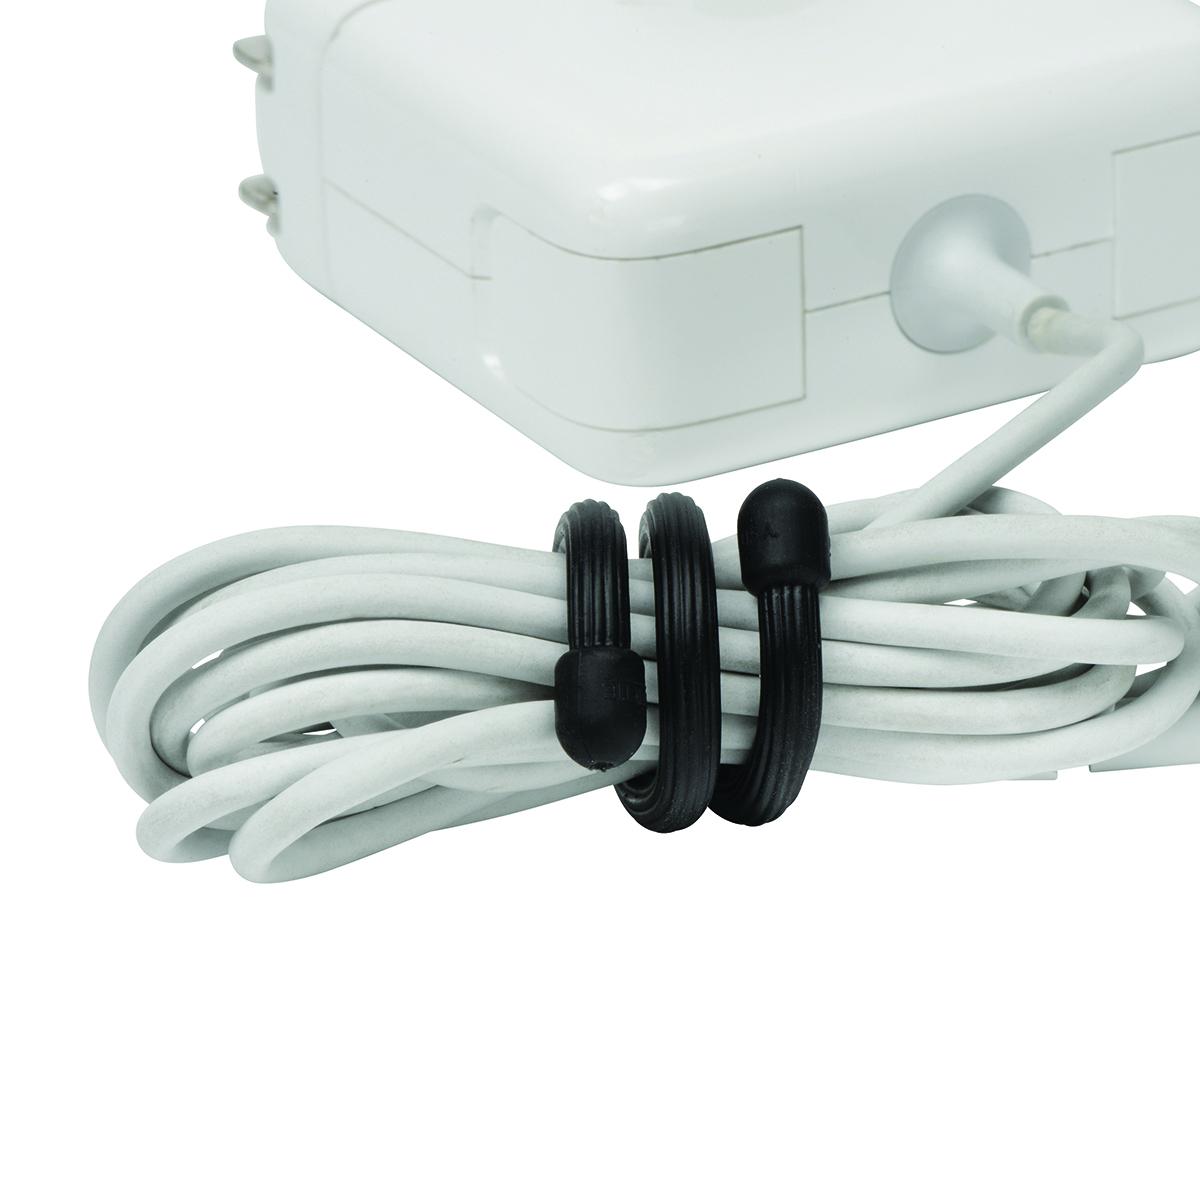 24-Inch Nite Ize Gear Tie Reusable Rubber Twist Tie 2-pack GT24-2PK-28 Forest Green